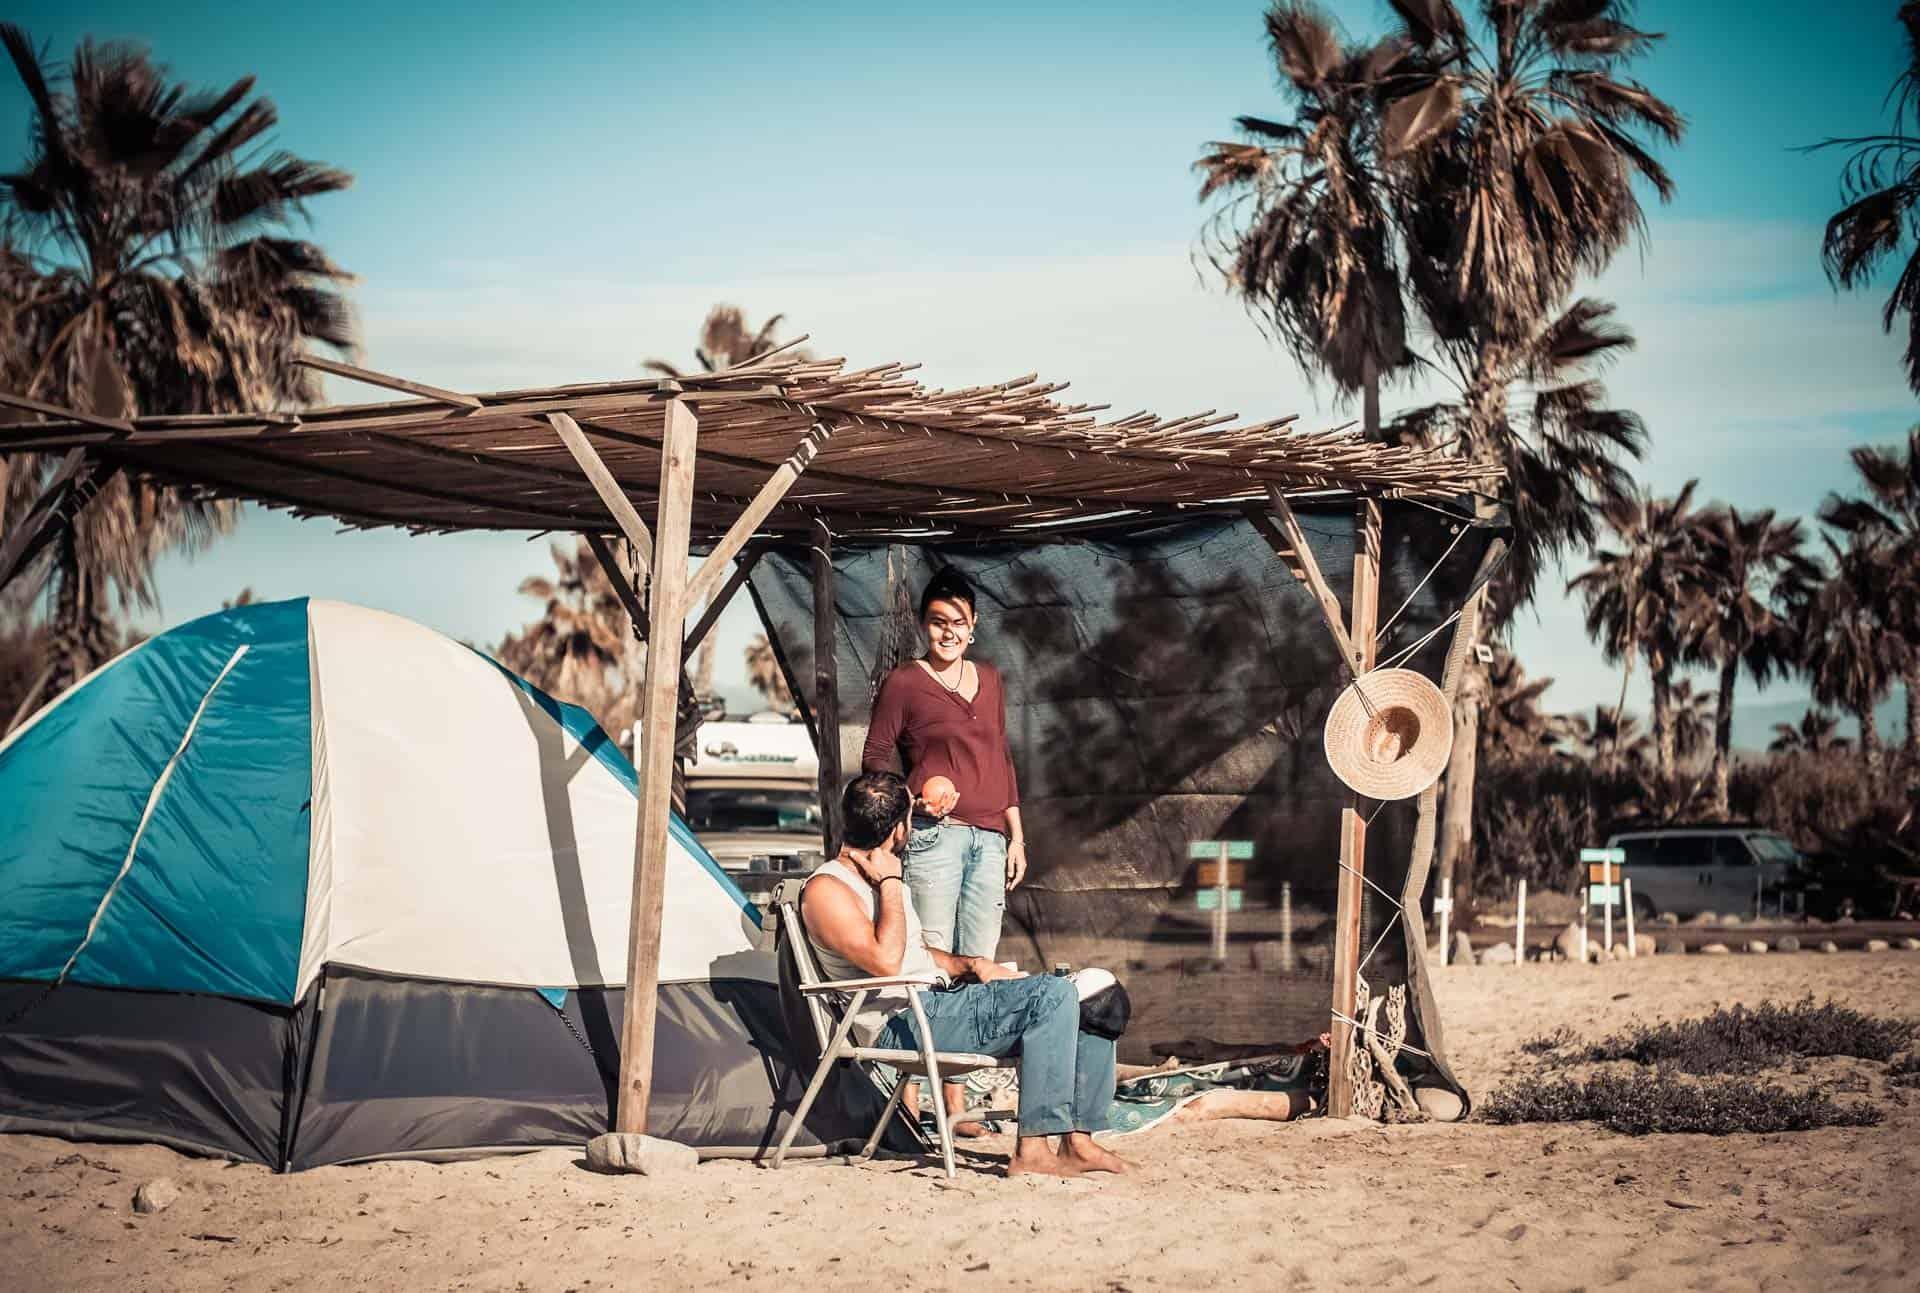 Christian Koehlert Photography Inhabitants Of San Pedrito